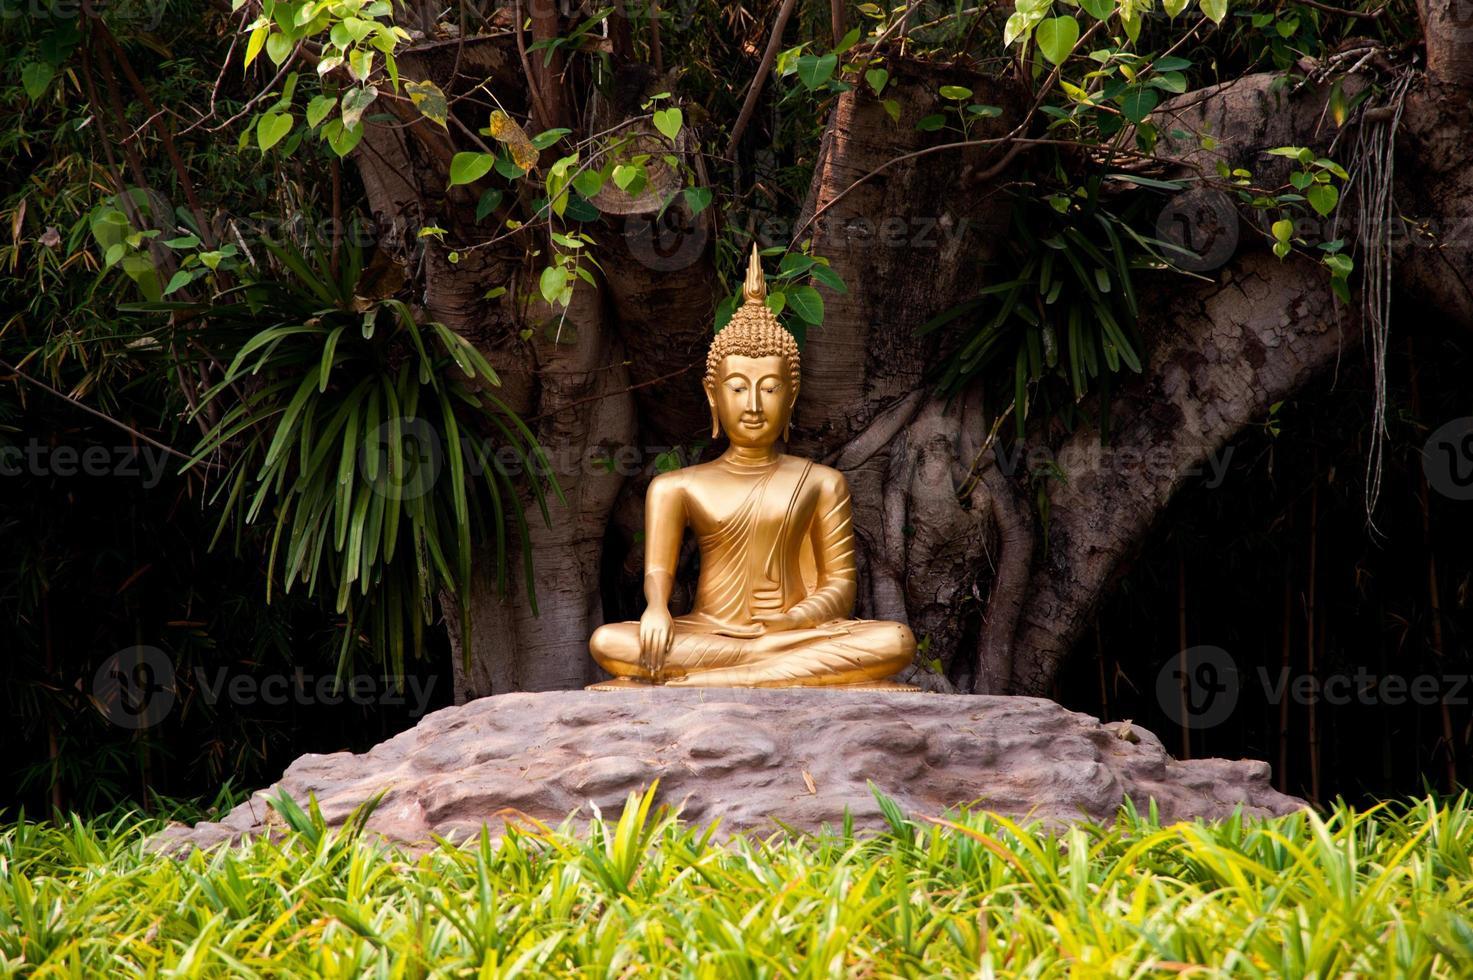 statua di Buddha in giardino foto